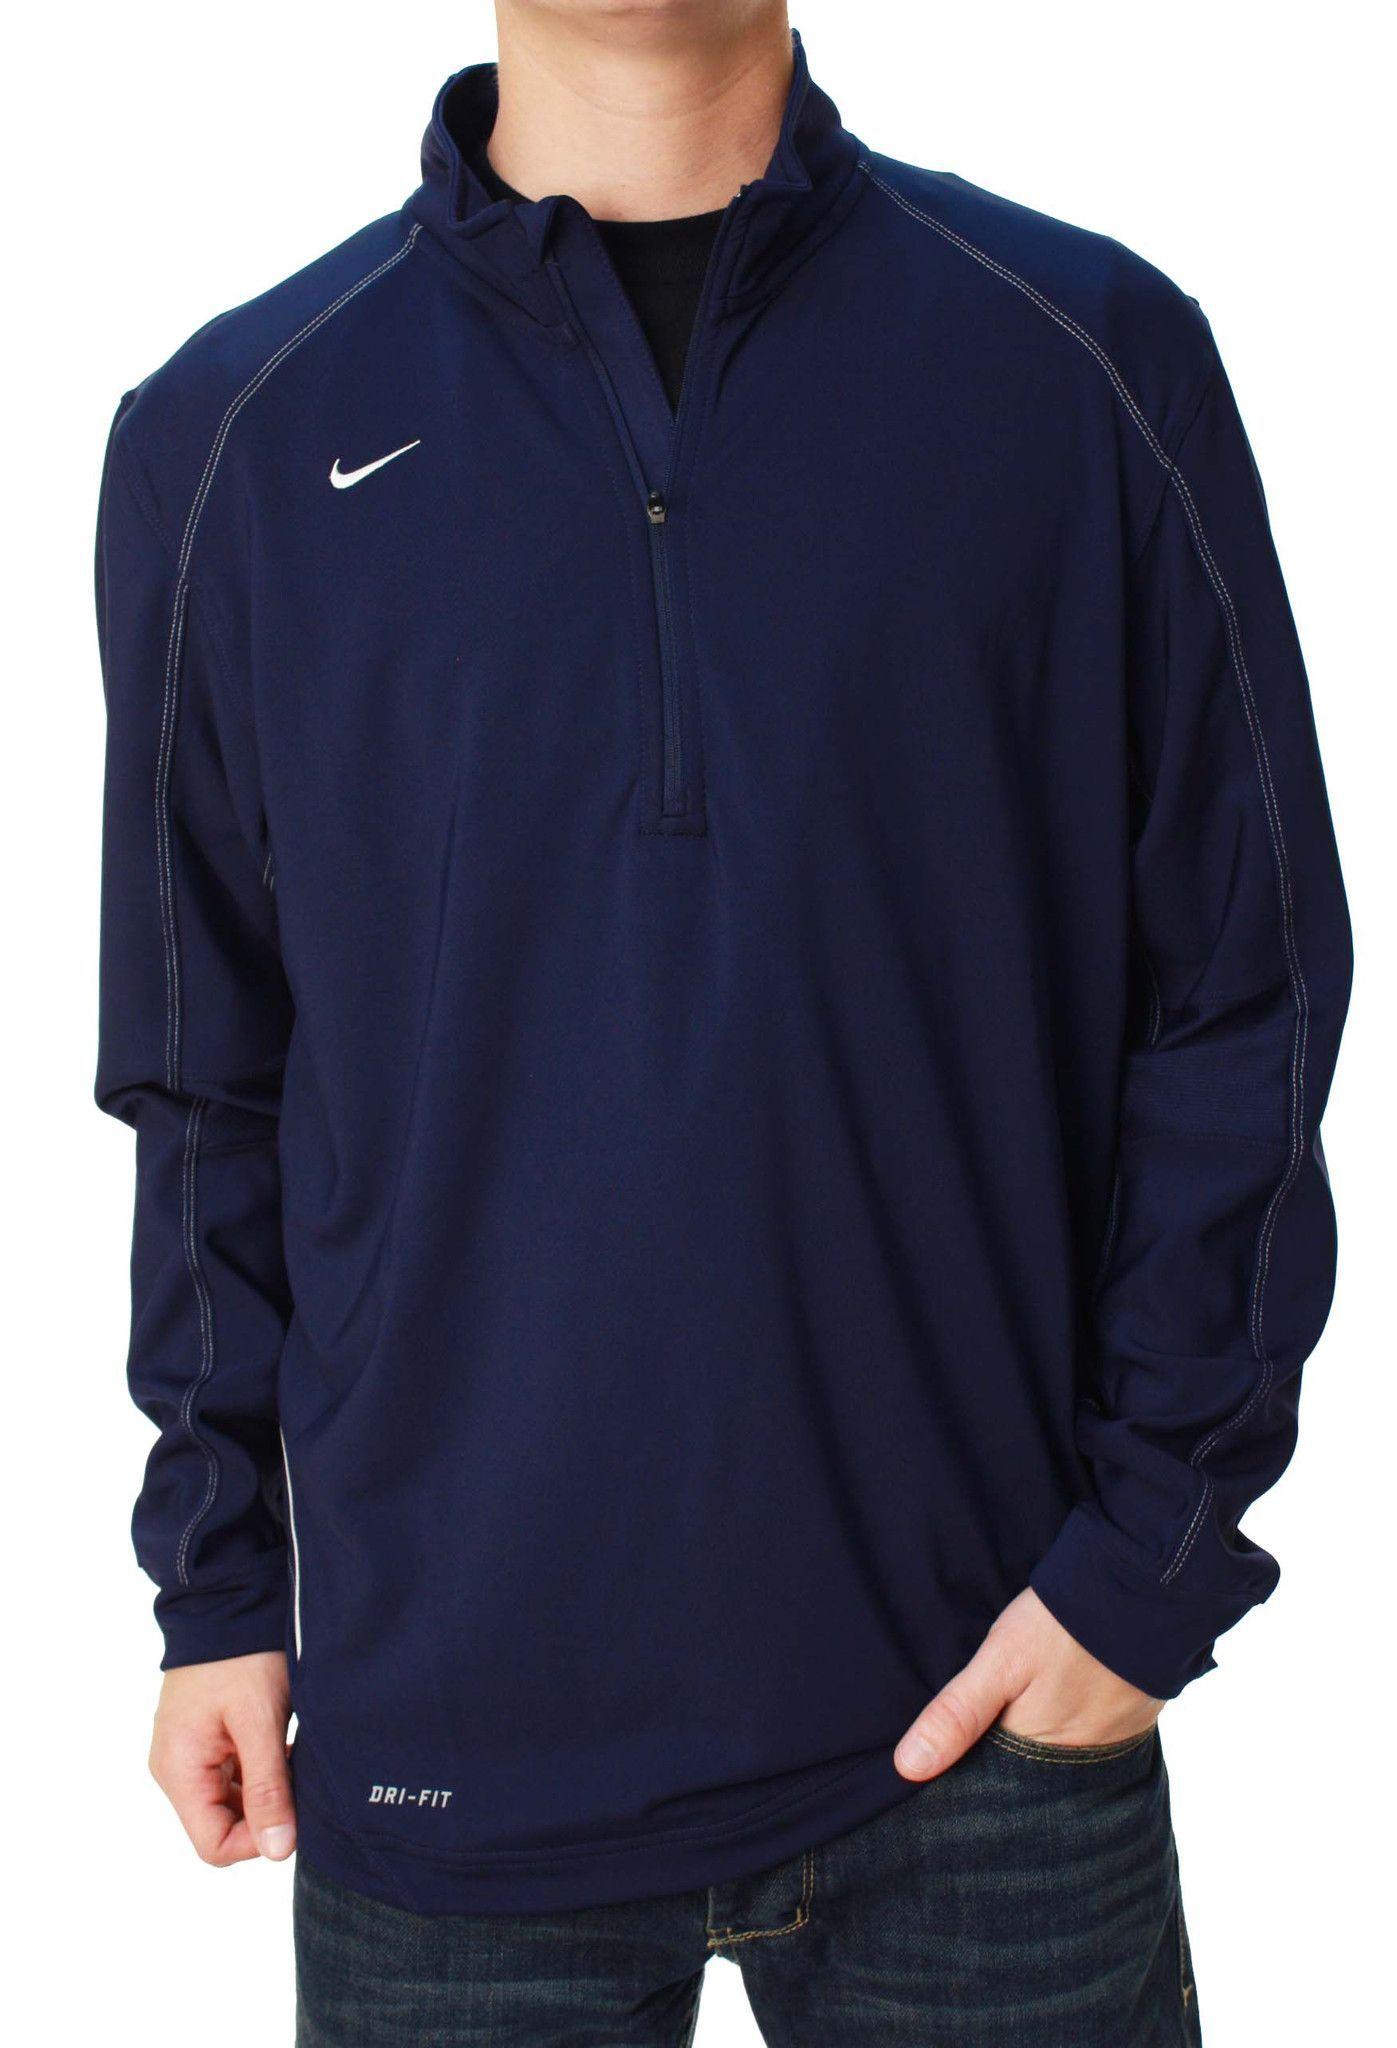 Nike Men\u0027s Dri-Fit Half-Zip Soccer Jacket